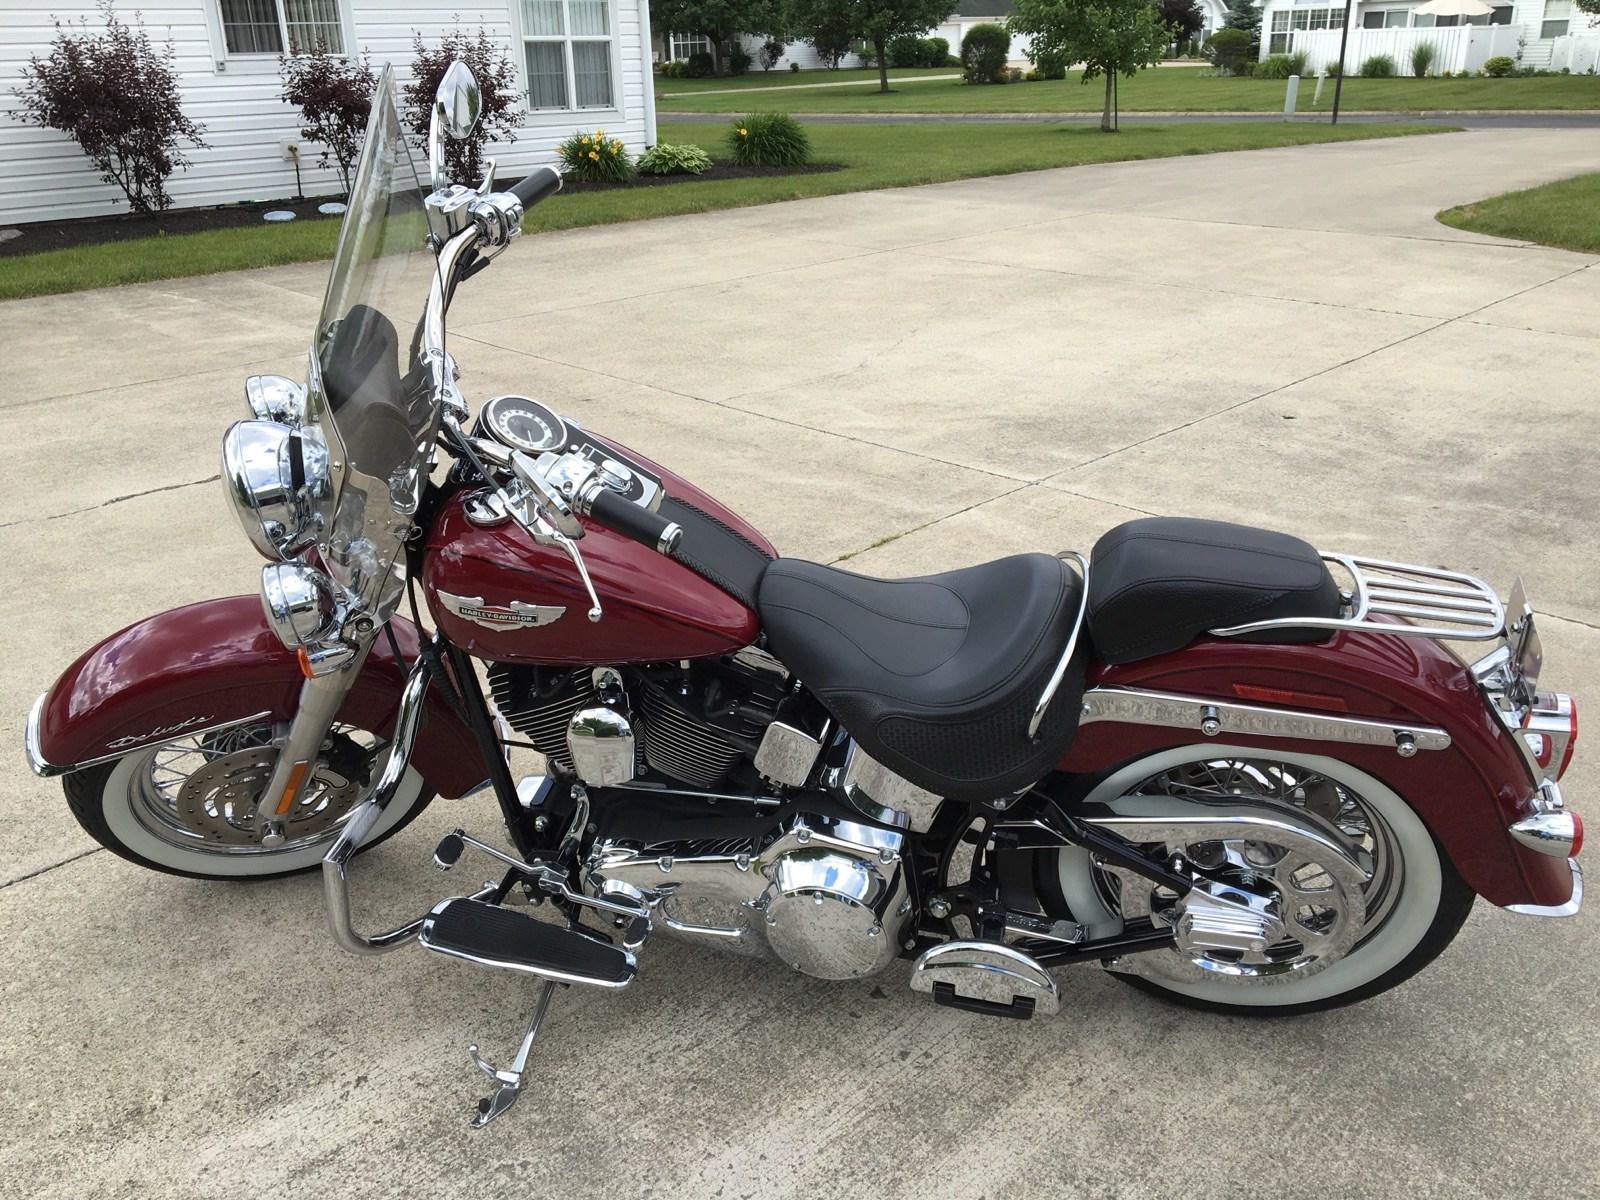 Harley Softail Motorcycles For Sale Ga >> 2006 Harley-Davidson® FLSTN/I Softail® Deluxe (Wine), Muncie, Indiana (740255) | ChopperExchange